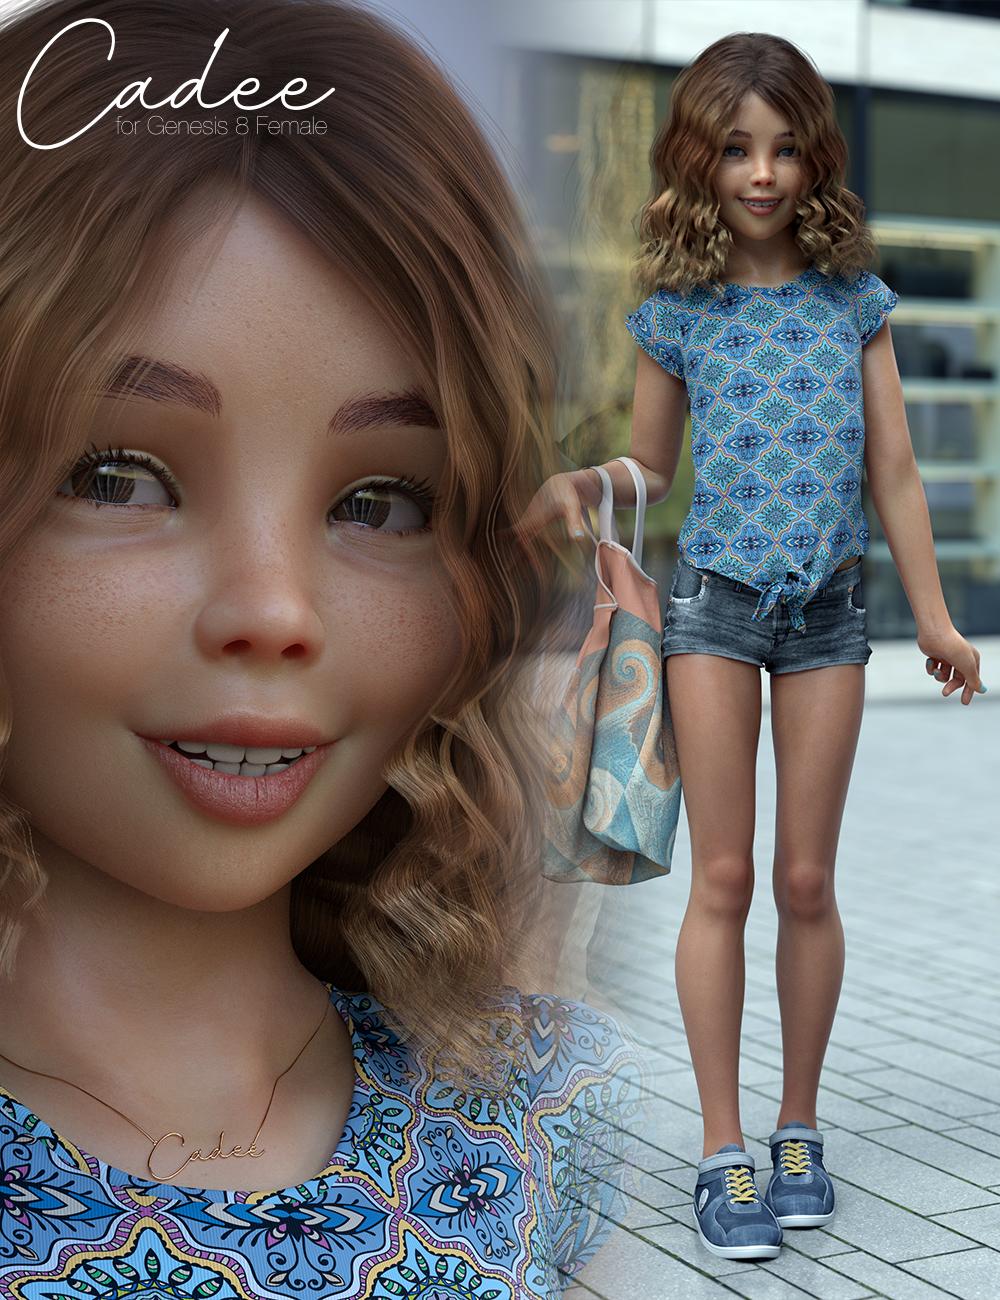 Cadee Bundle for Genesis 8 Female(s) by: 3D Universe, 3D Models by Daz 3D